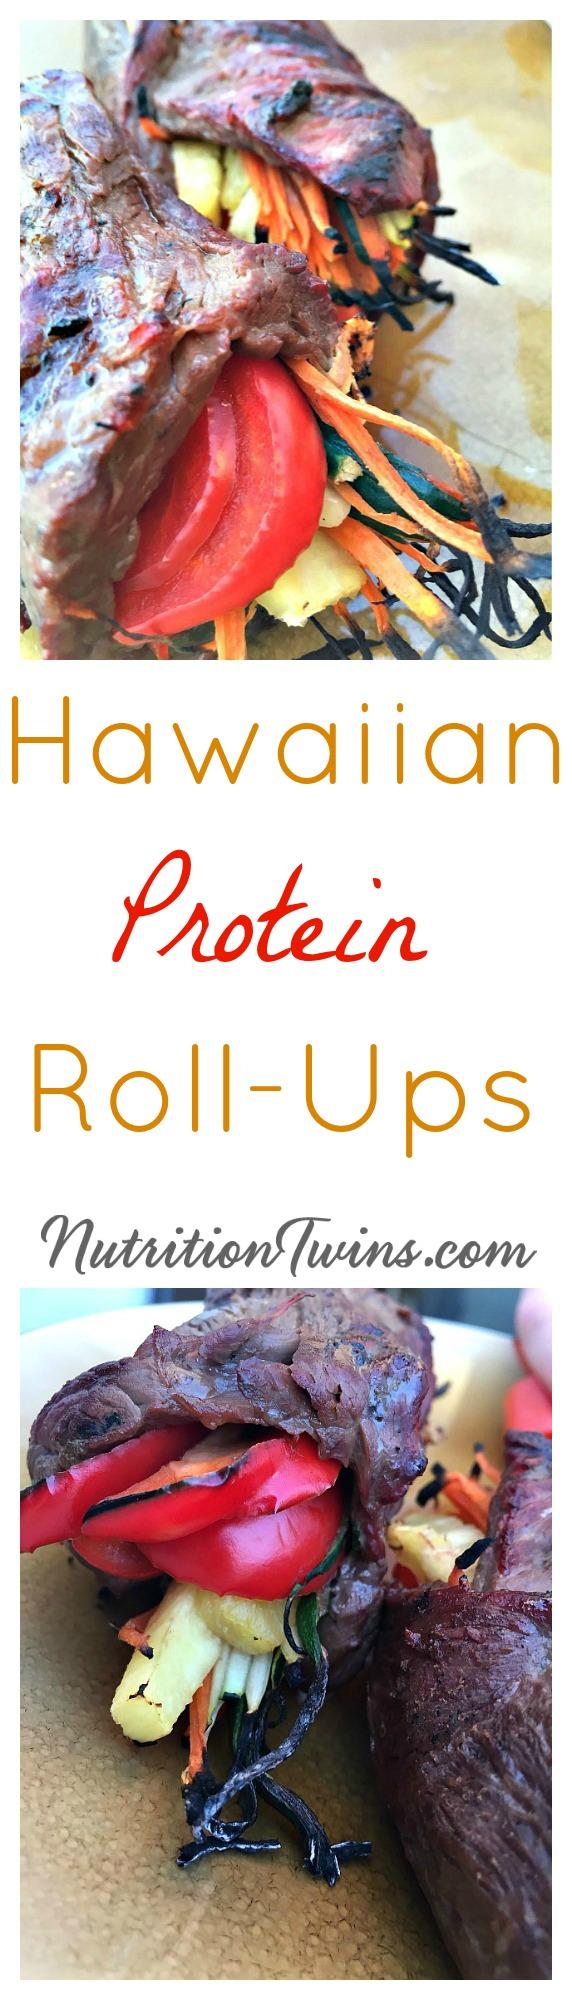 Hawaiian_Protein_Roll_Ups_Pinterest